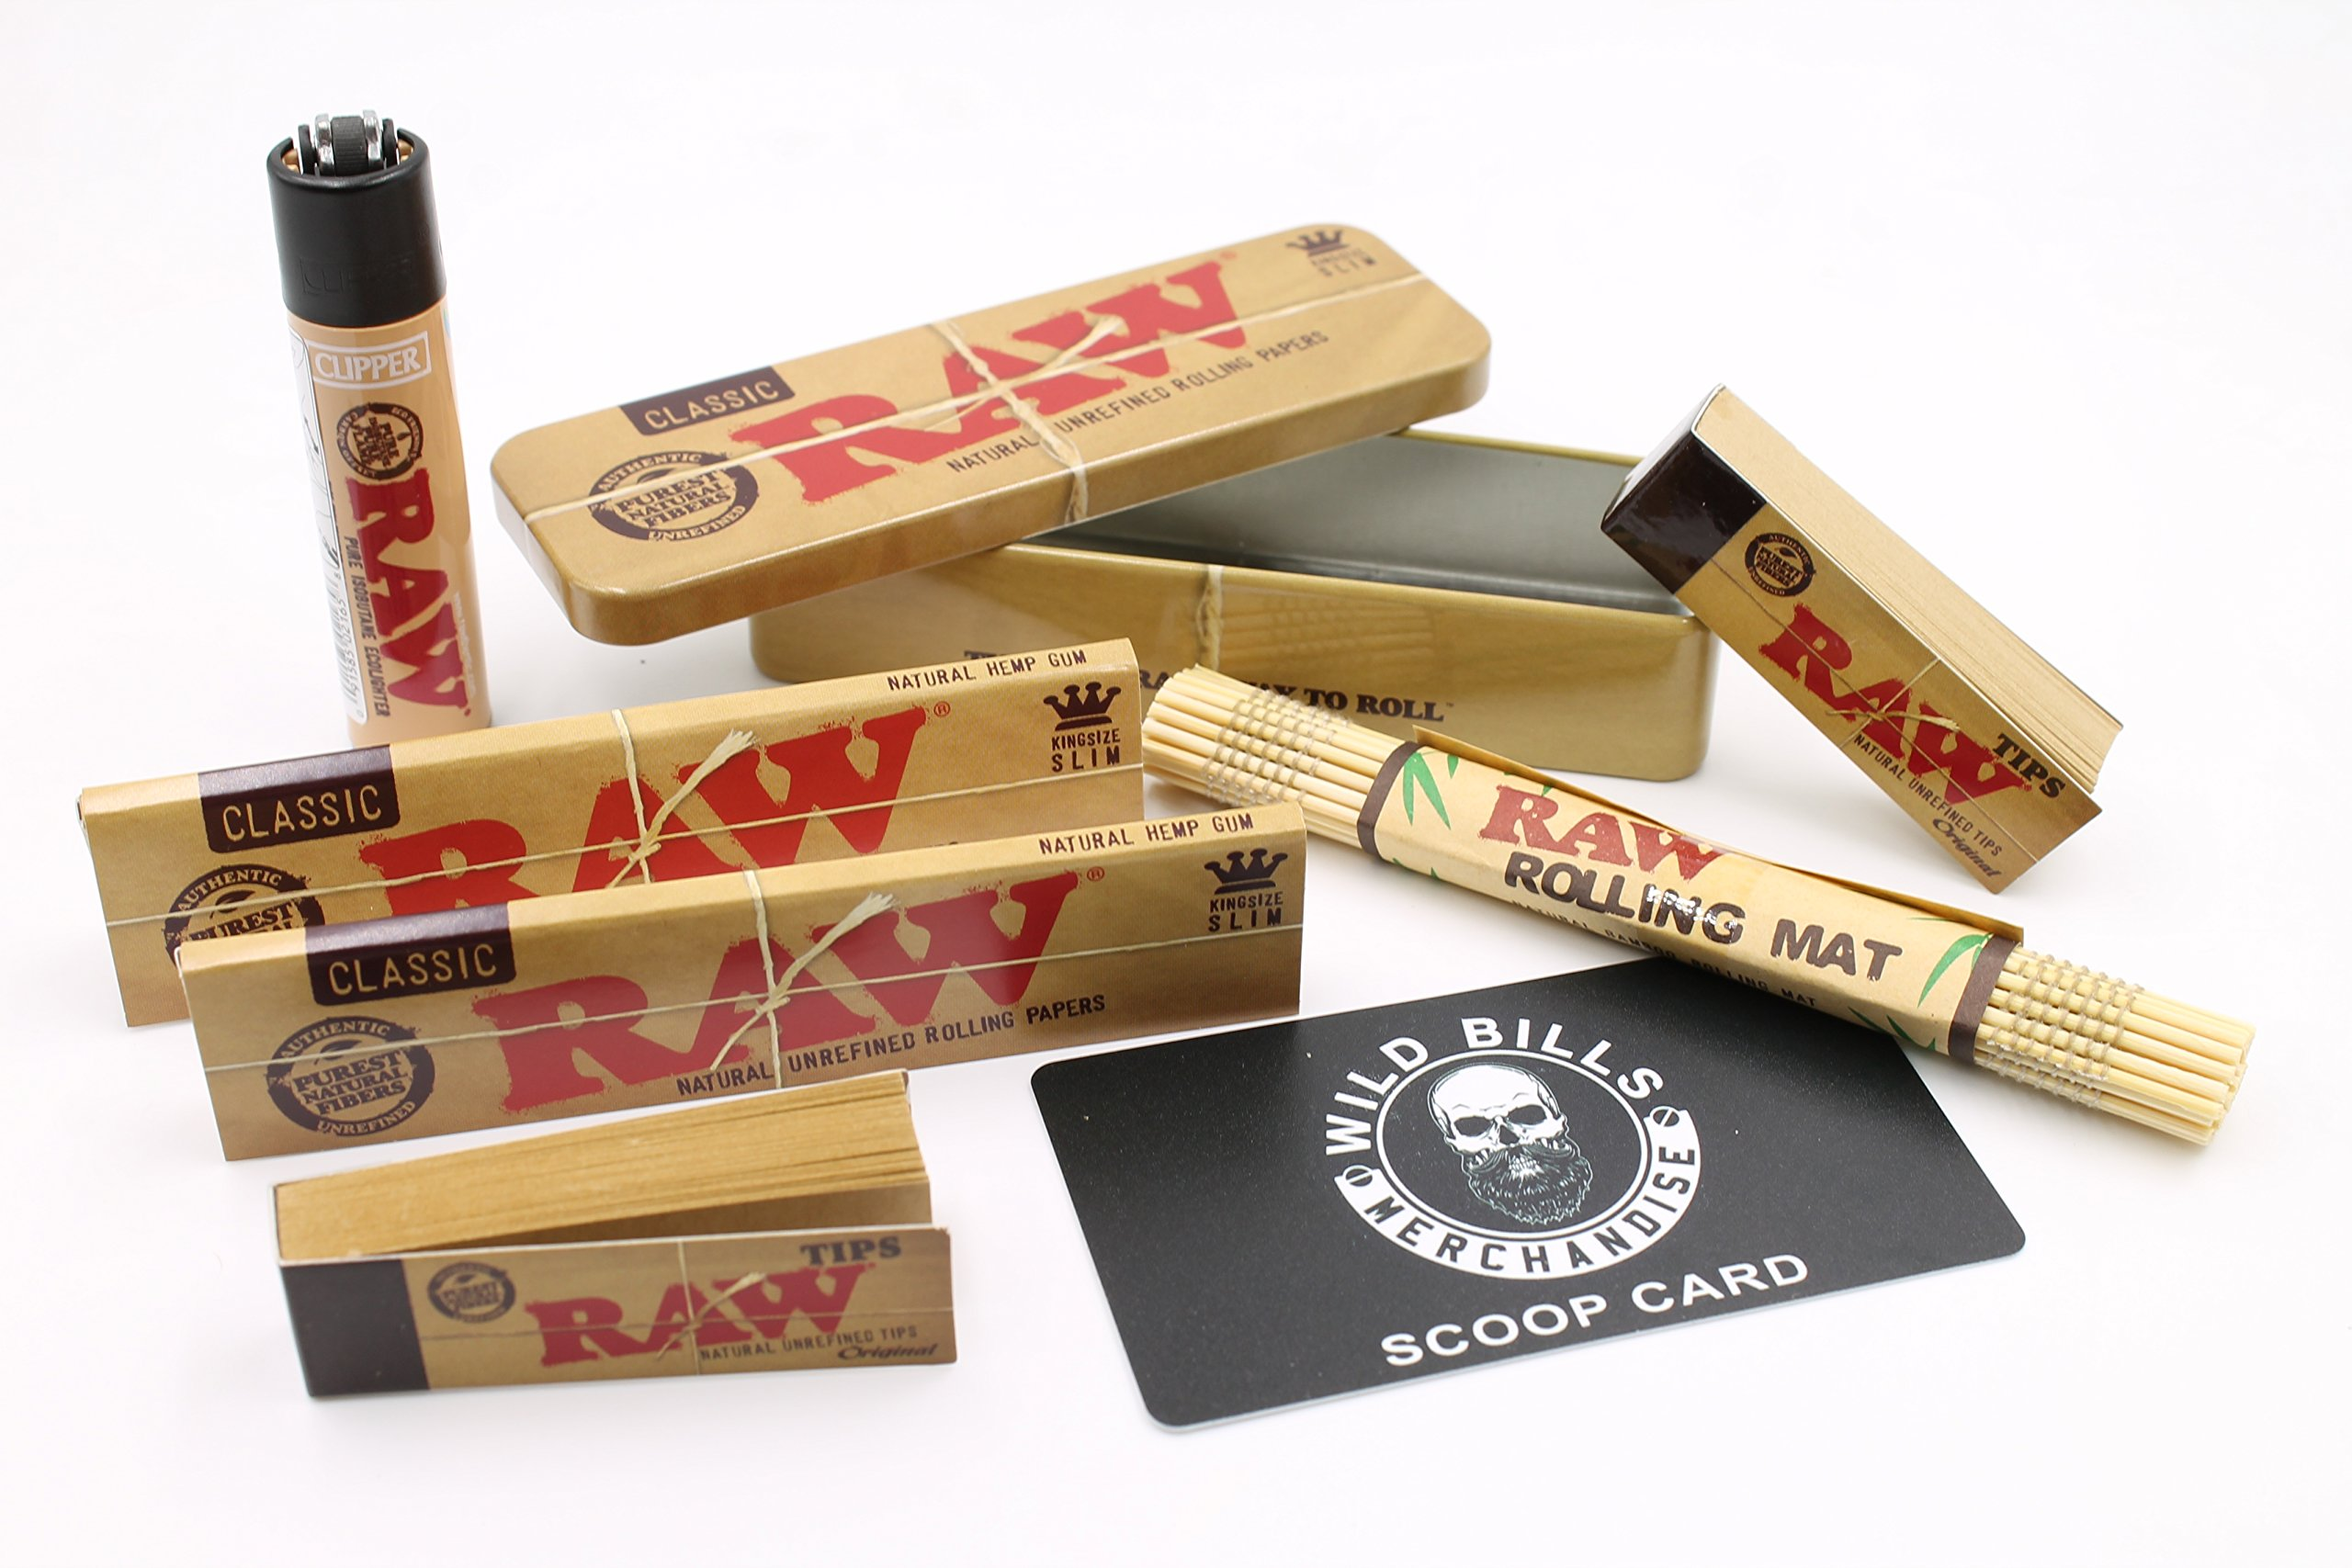 Bundle - 7 Items - Raw- 2 King Size Slim Rolling Paper,1 King Size Tin, 1 Hemp Leaf Clipper Lighter,1 Raw Bamboo Mat, 1 Raw Tip